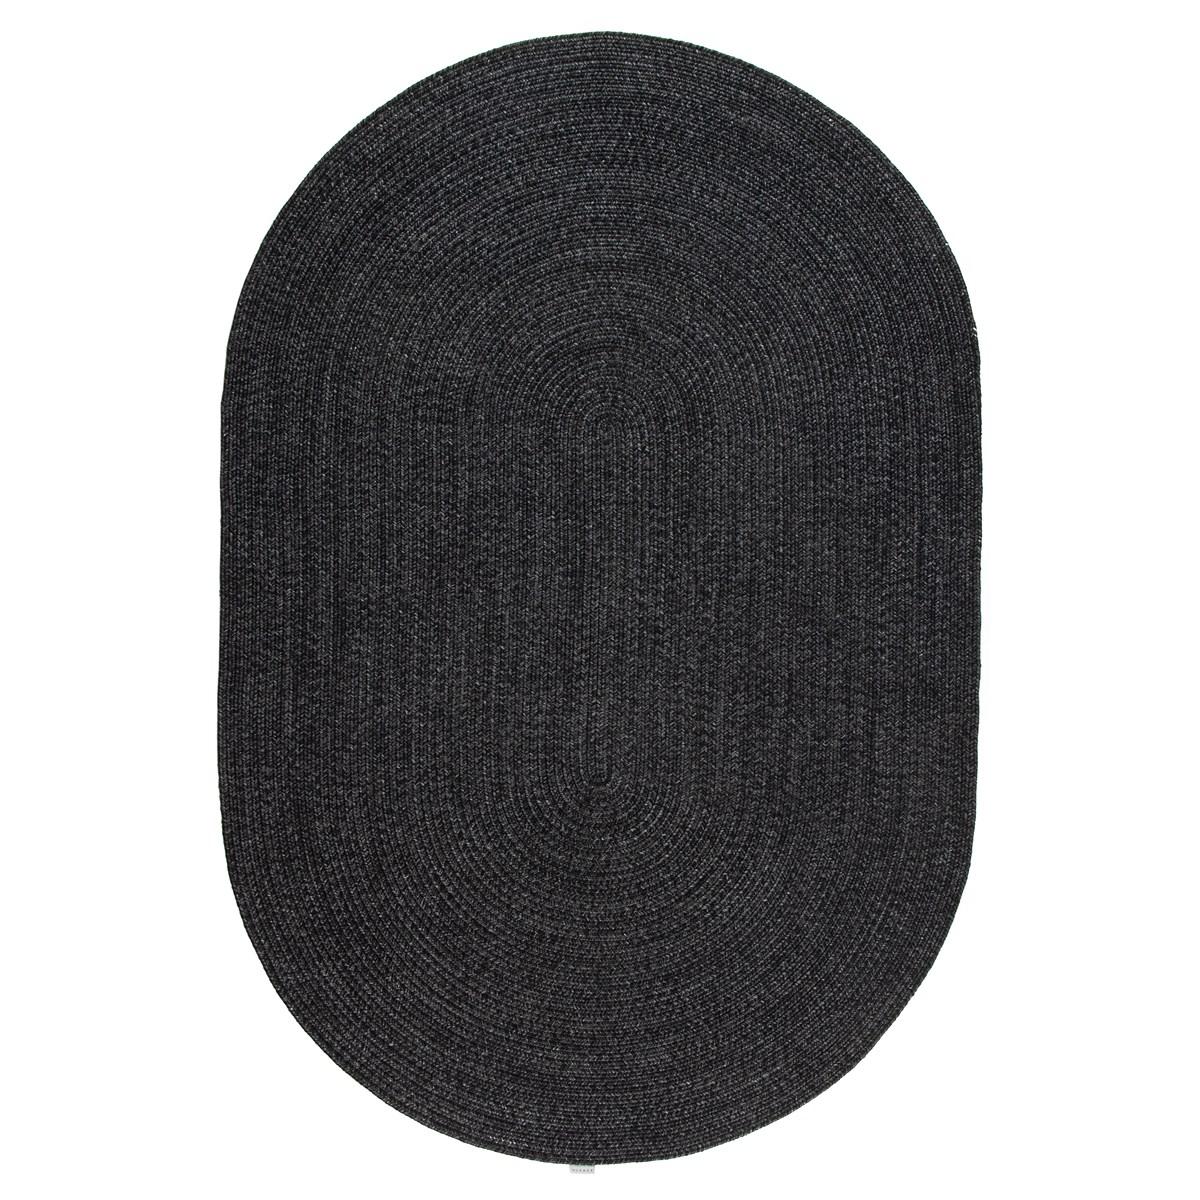 Tapis de salon en Polypropylène Gris anthracite 60x120 cm